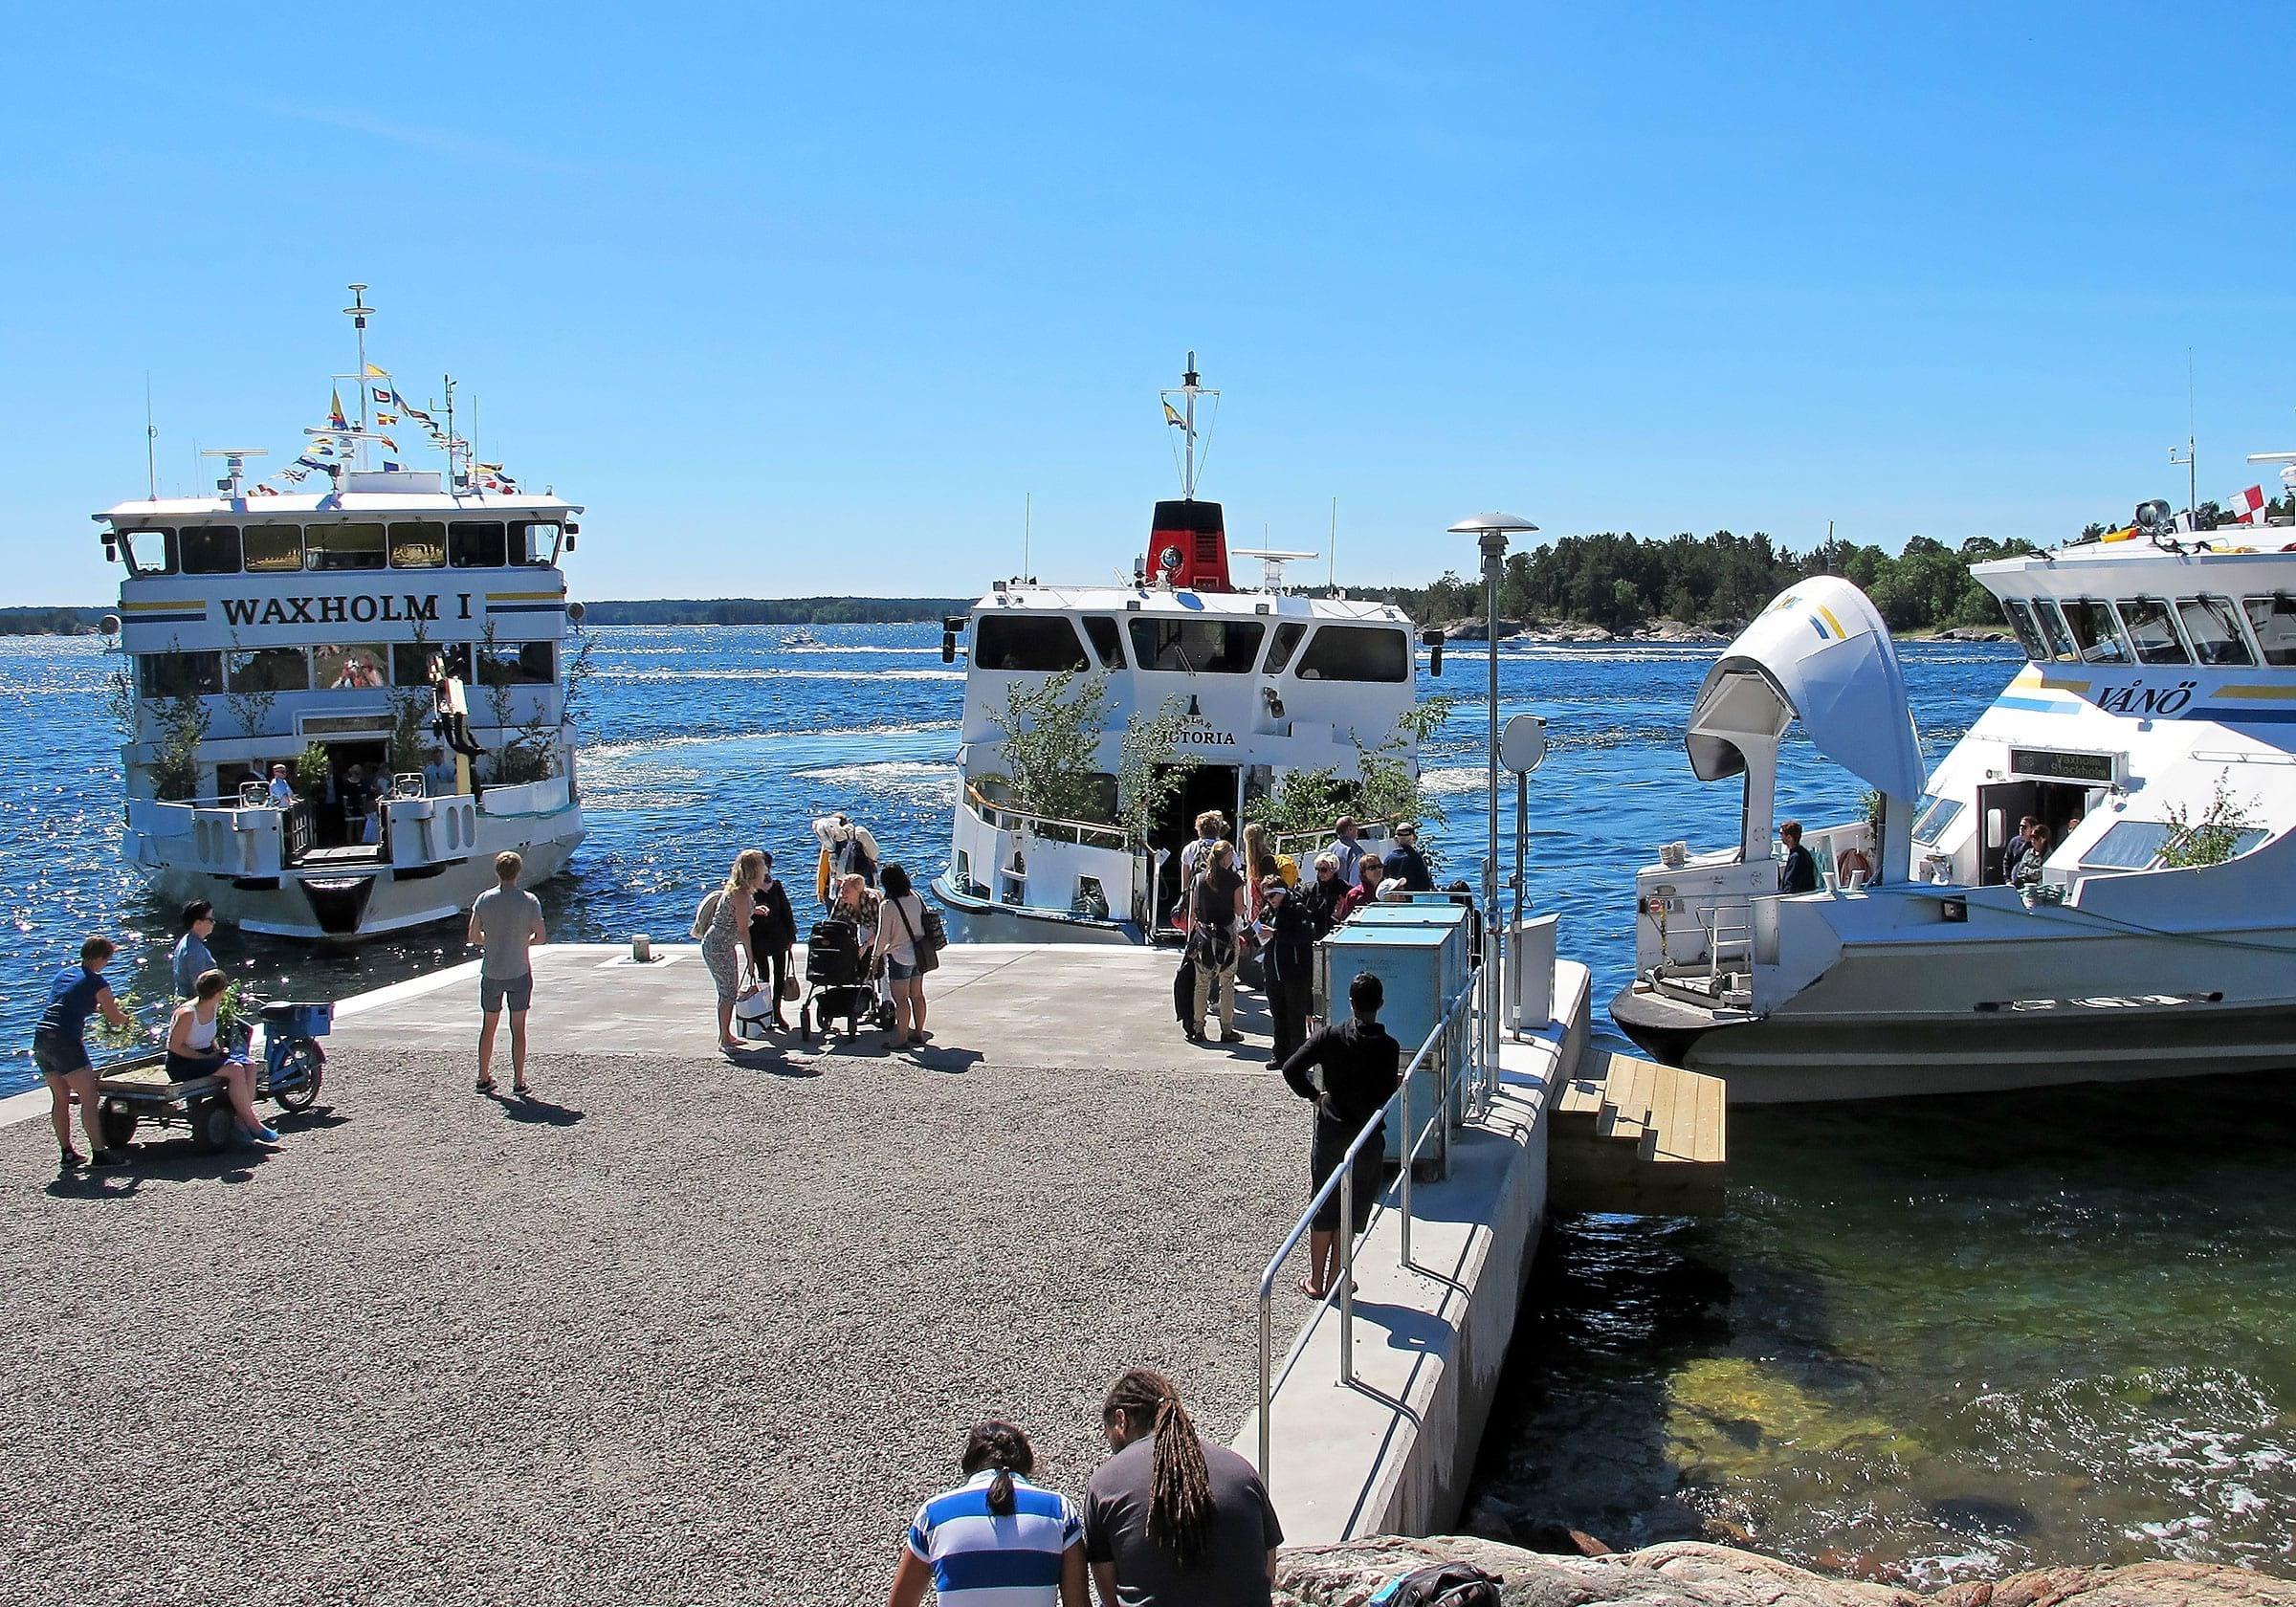 Sightseeing, utflykter & matkryssningar i Stockholm - Stromma